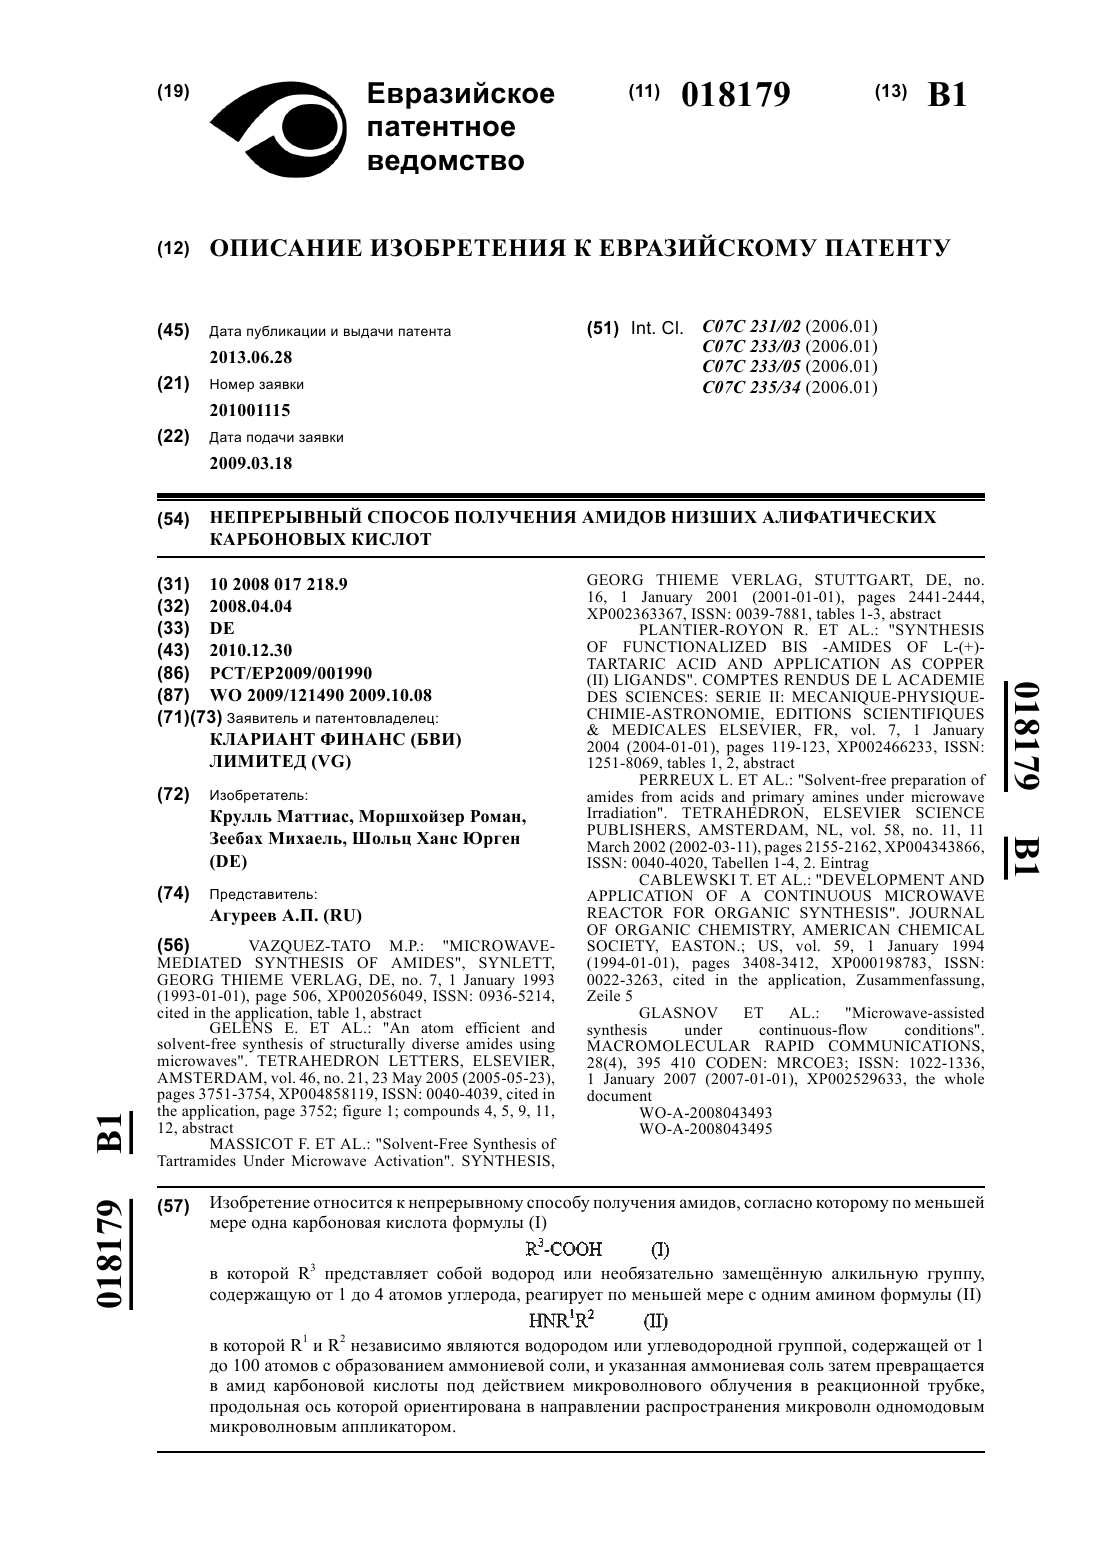 Http://ruwikipediaorg/wiki/маркузе,герберт